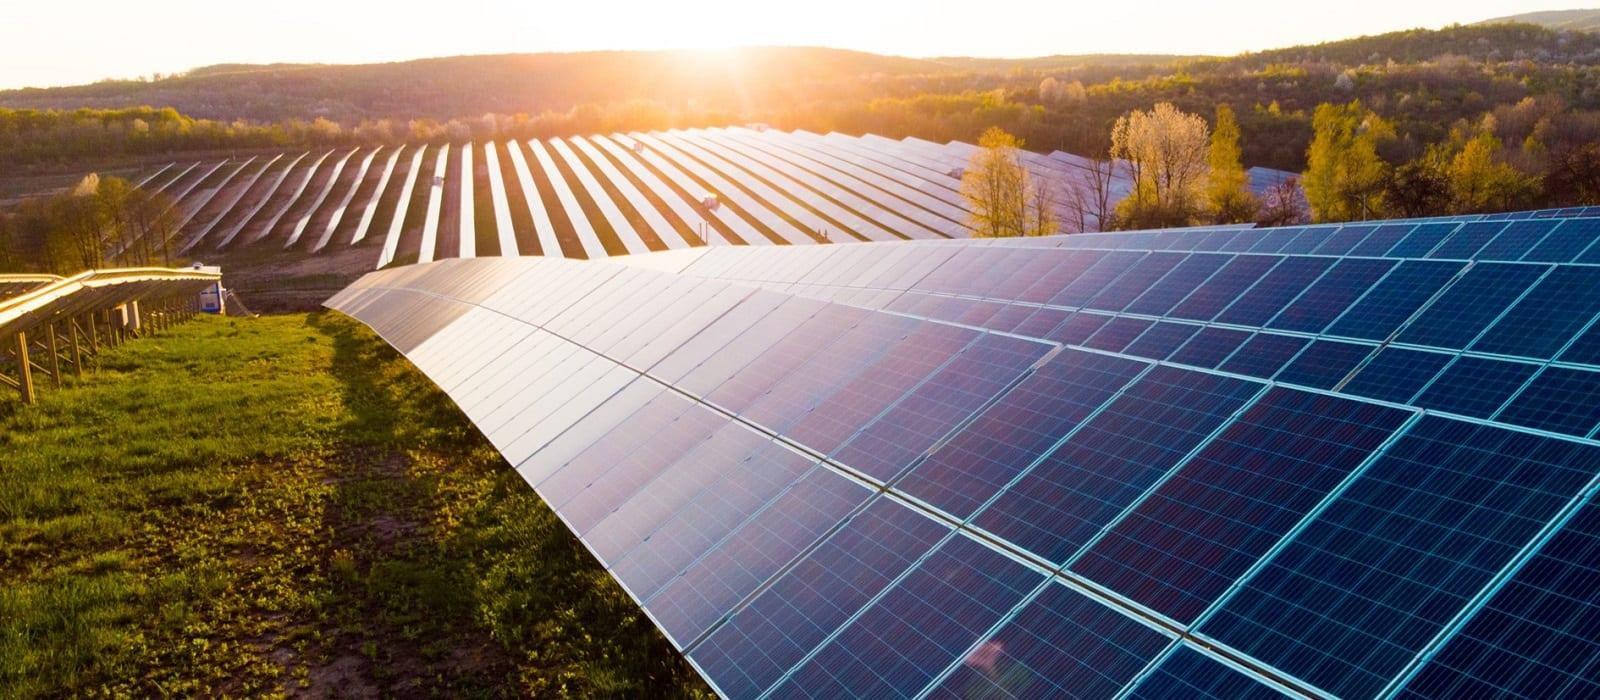 green-energy-bonds-cbi-climate-renewable